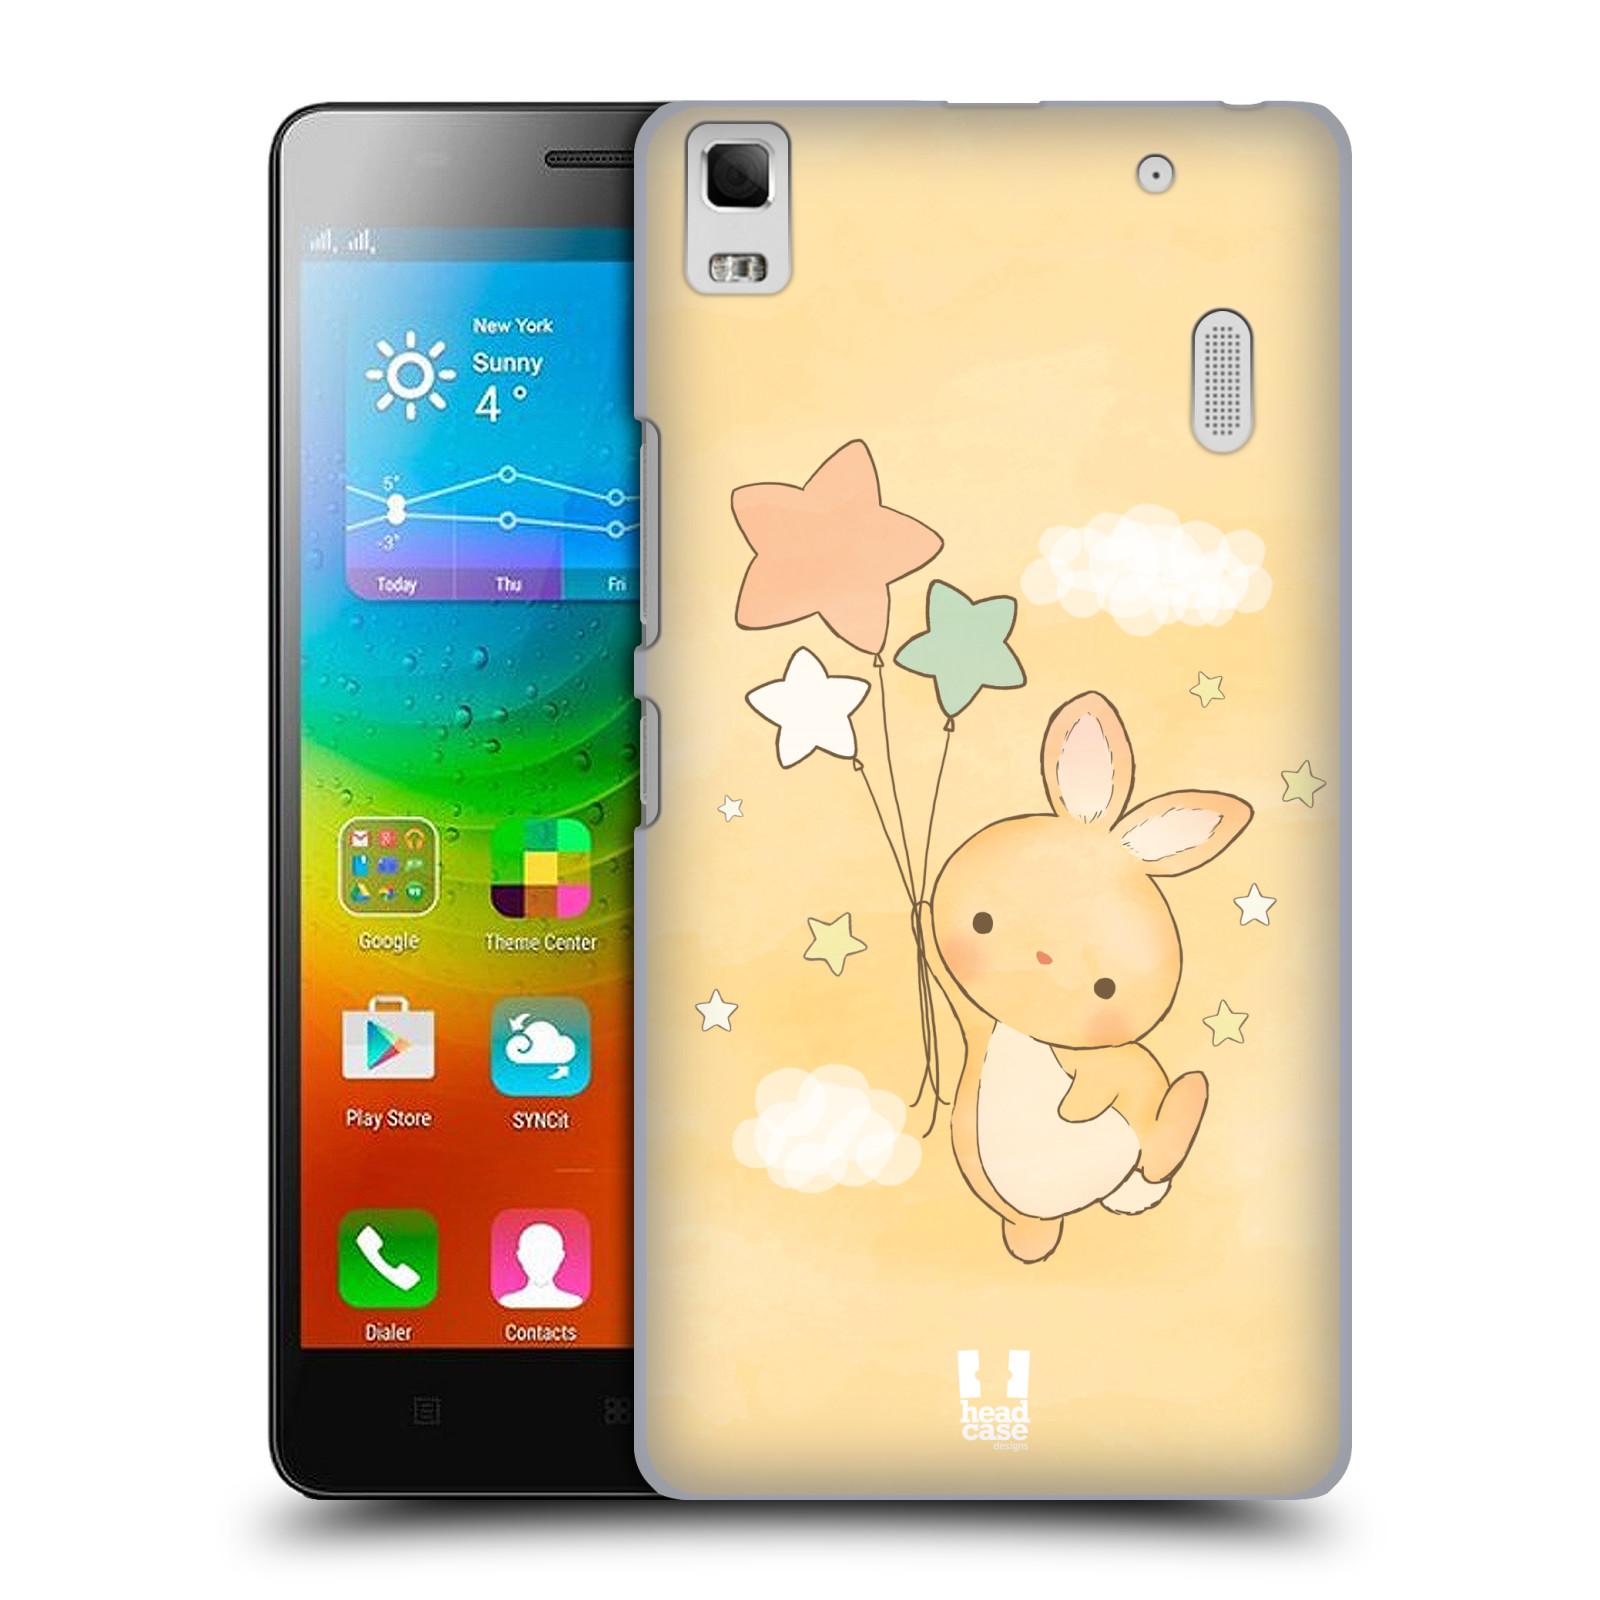 HEAD CASE pevný plastový obal na mobil LENOVO A7000 / A7000 DUAL / K3 NOTE vzor králíček a hvězdy žlutá